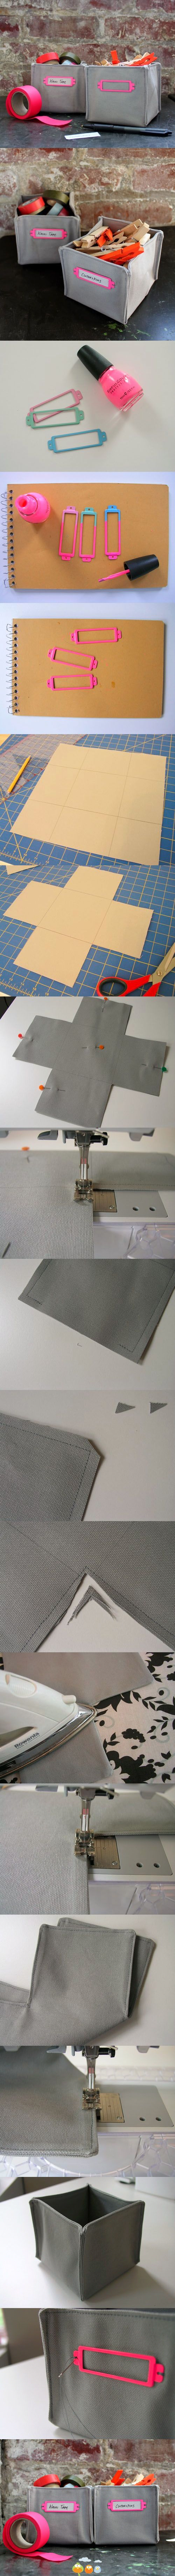 tuto panier rangement tissu